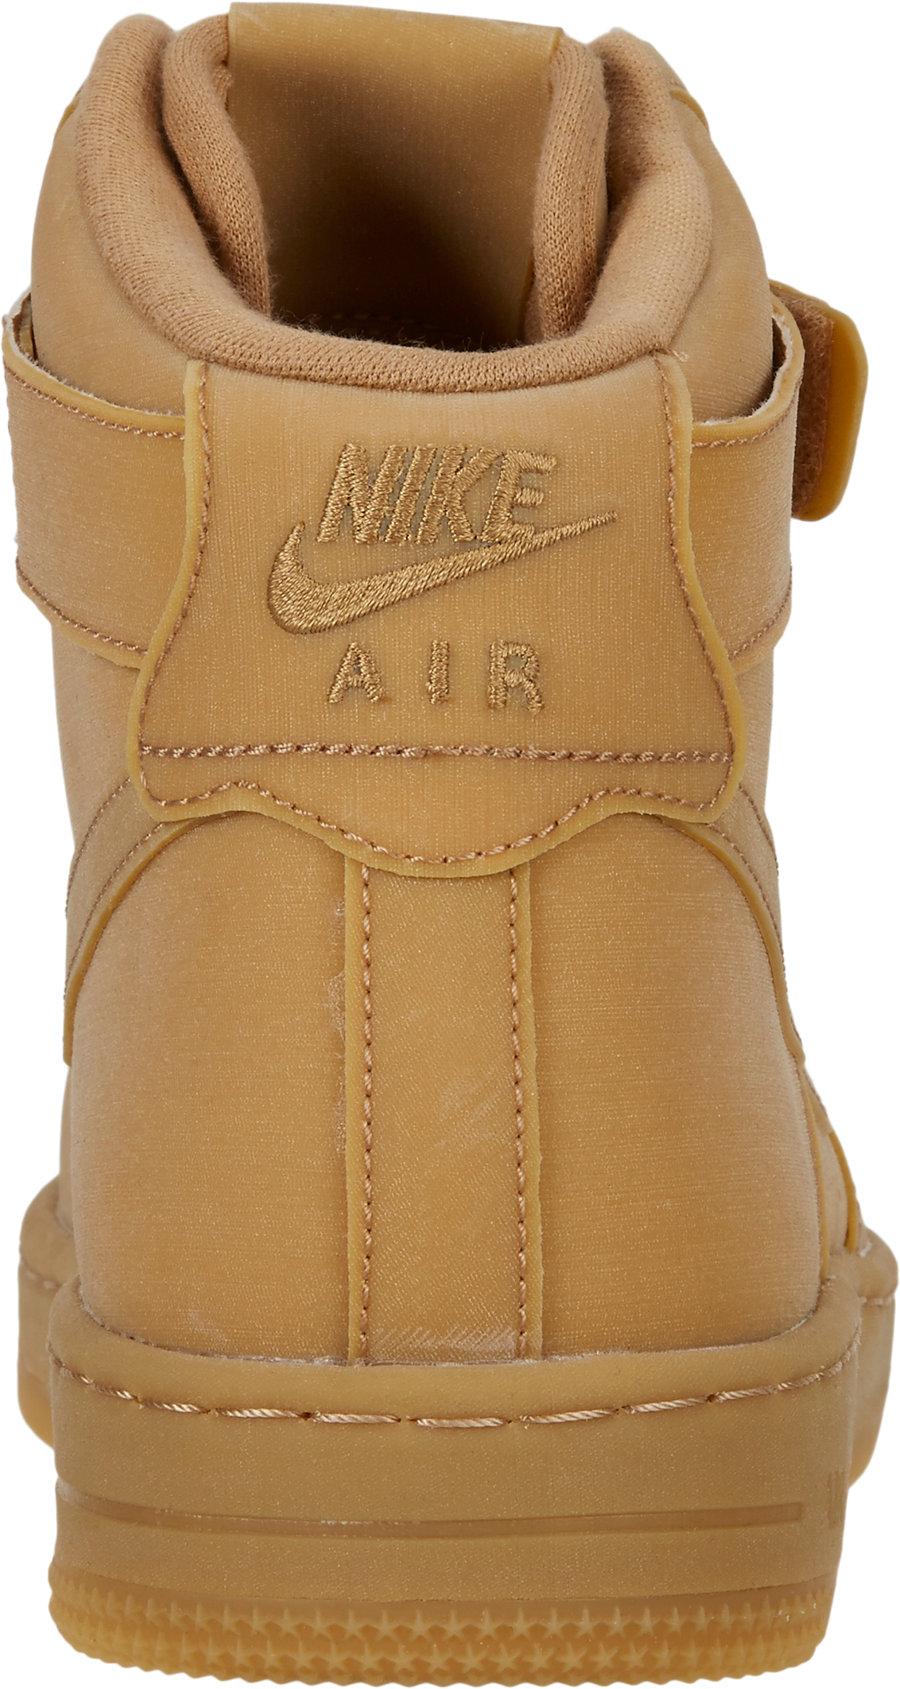 Nike Brown Air 1 Hightop Downtown Gum Force Sneakers Hi In Lyst 54LAj3qR